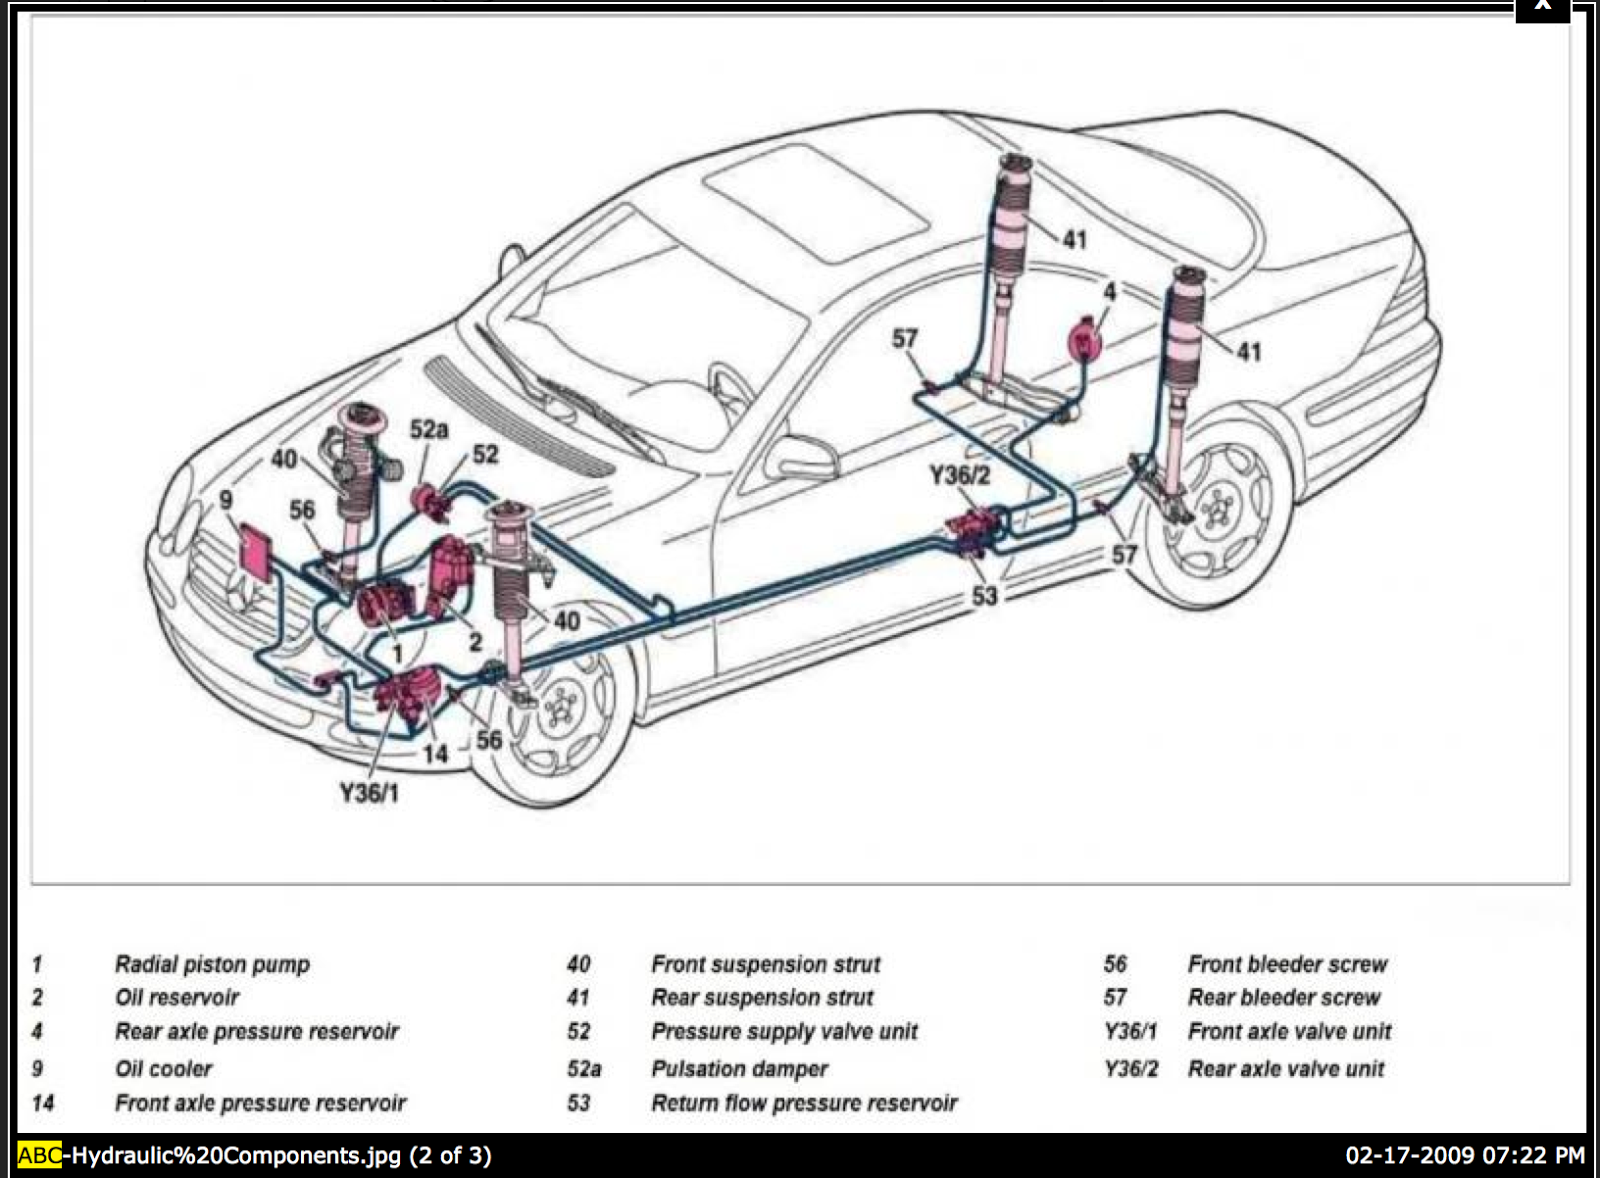 Mercedes Benz Sl500 Wiring Diagram Subaru Map Sensor 2003 S500 Fuse Chart Free Engine Image For